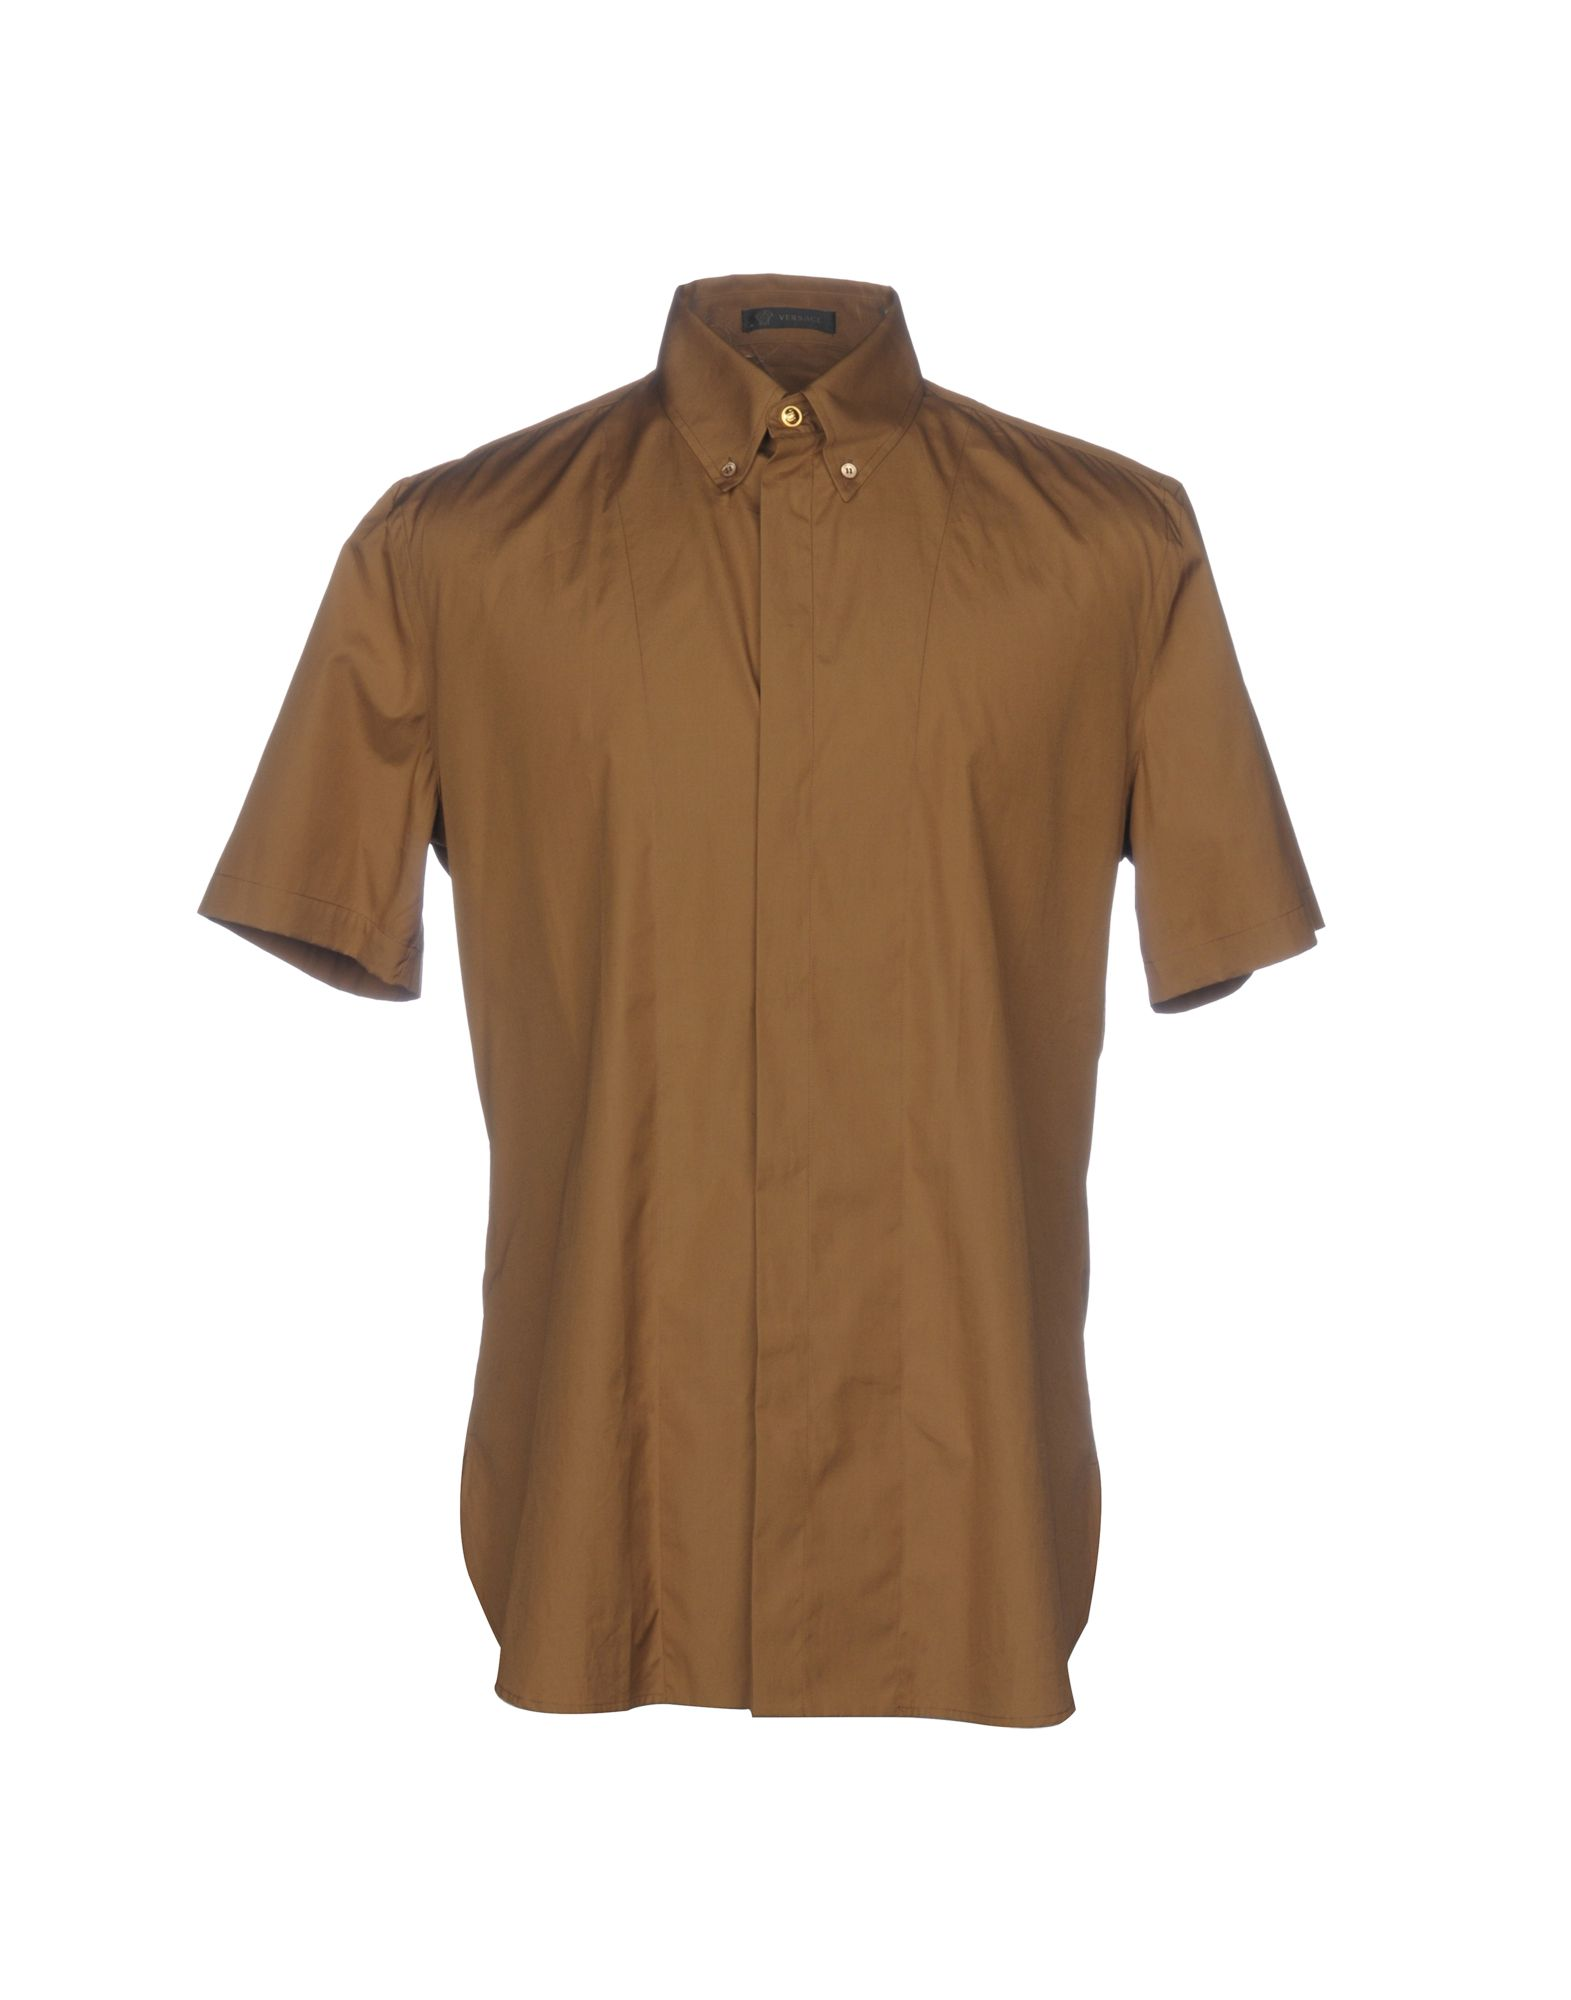 Camicia Camicia Camicia Tinta Unita Versace Uomo - 38596358QM a6e15b